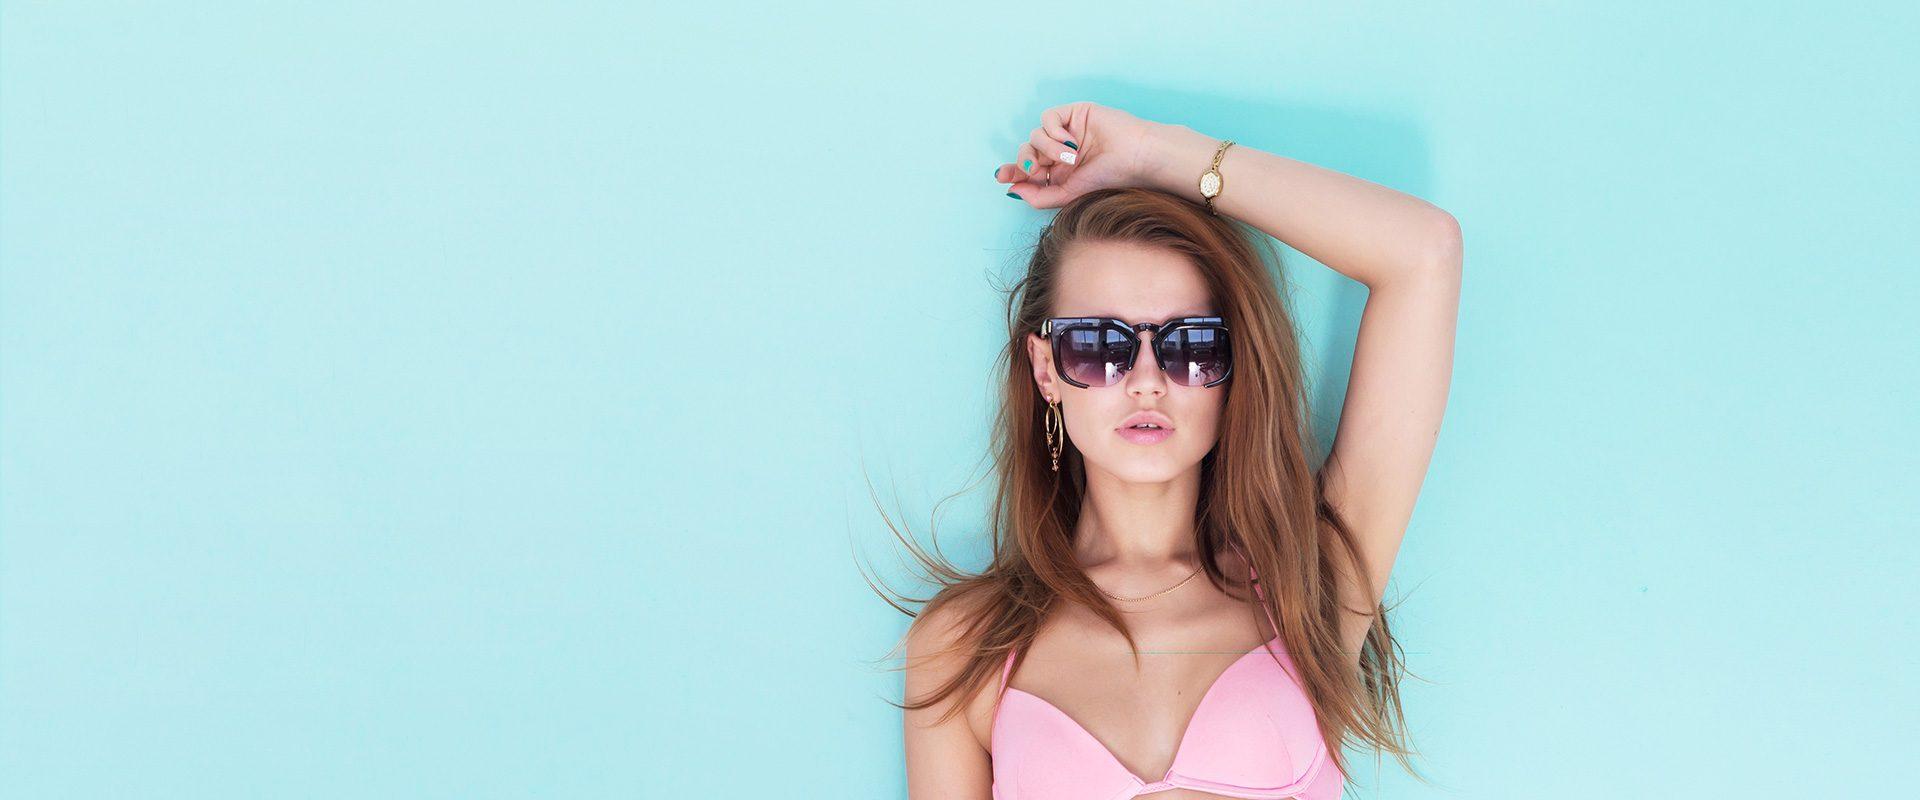 Haircare: Shampoos & Masks